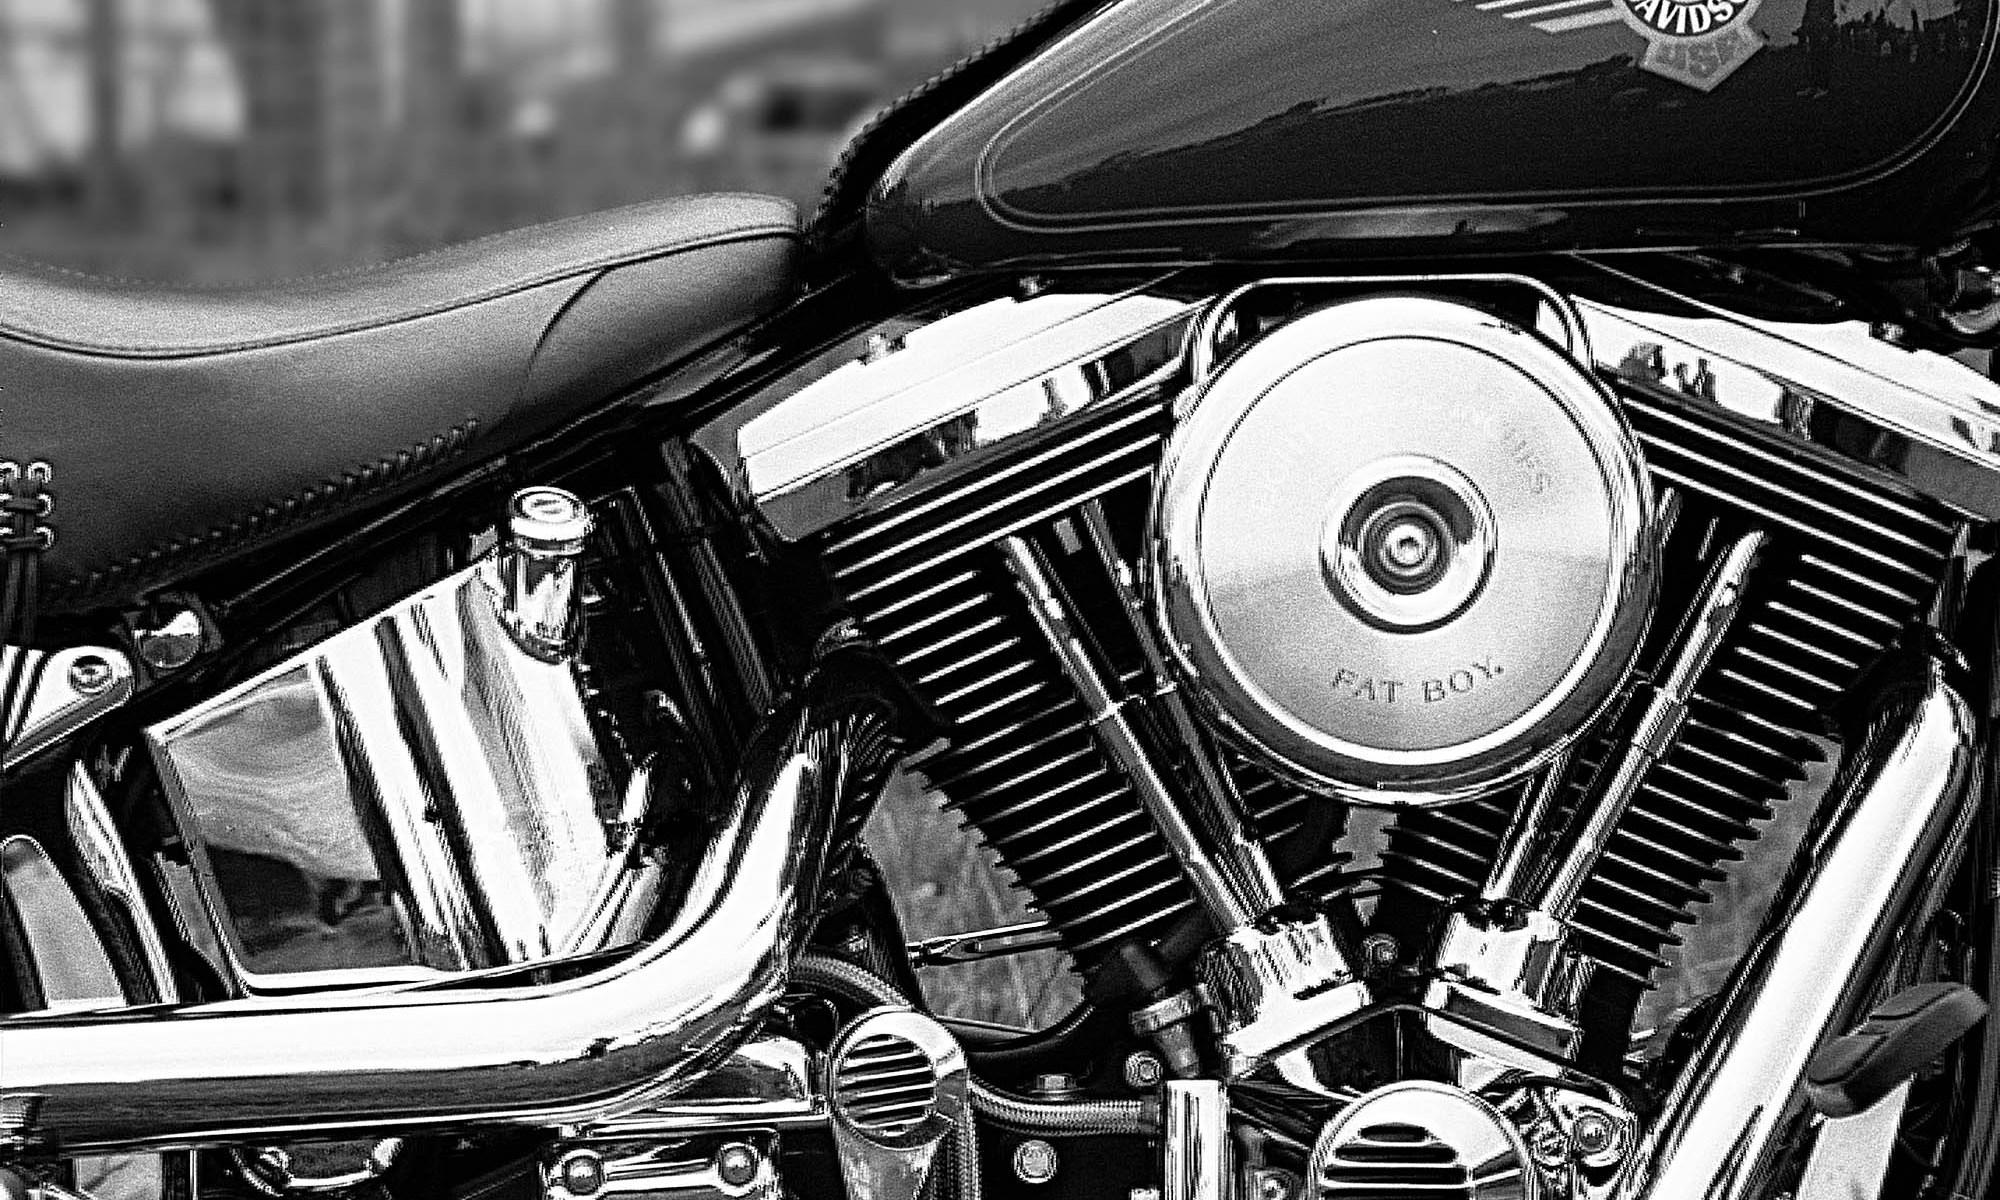 Fat Boy Harley Davidson Motorbike